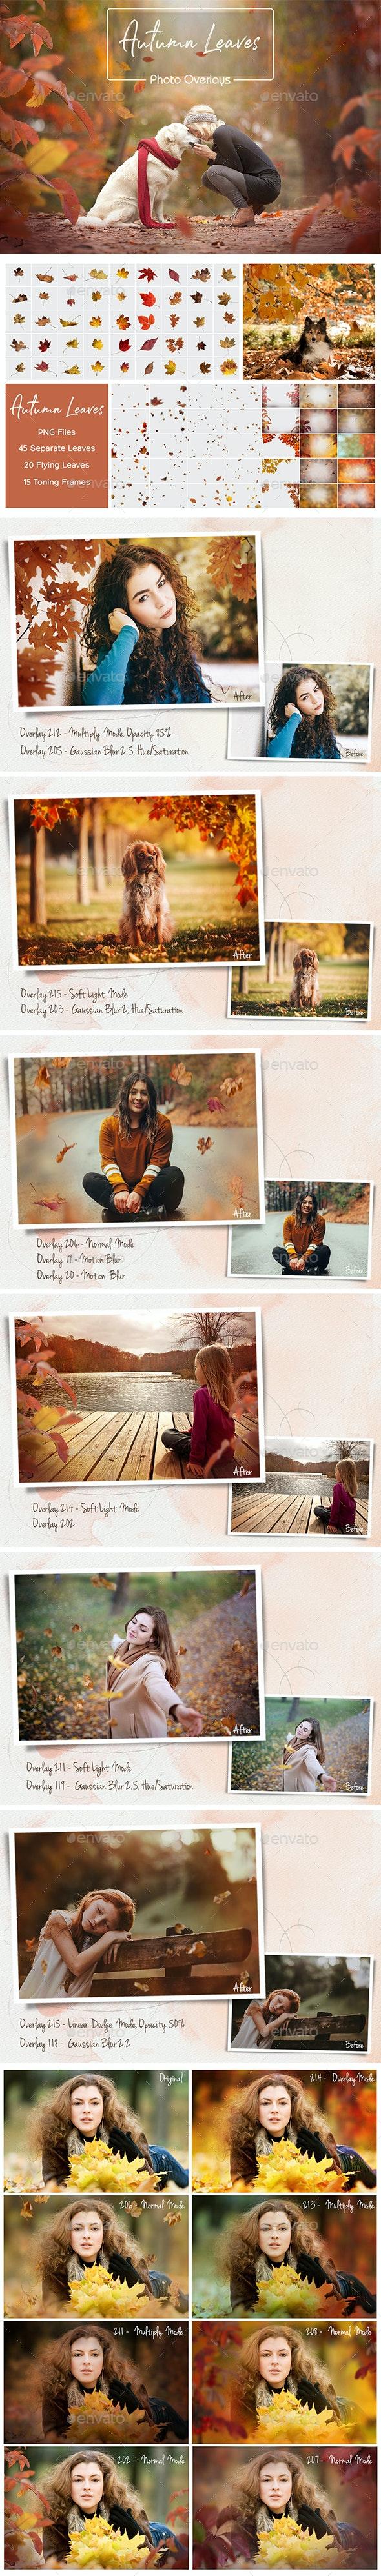 Autumn Leaves Overlays - Artistic Photo Templates